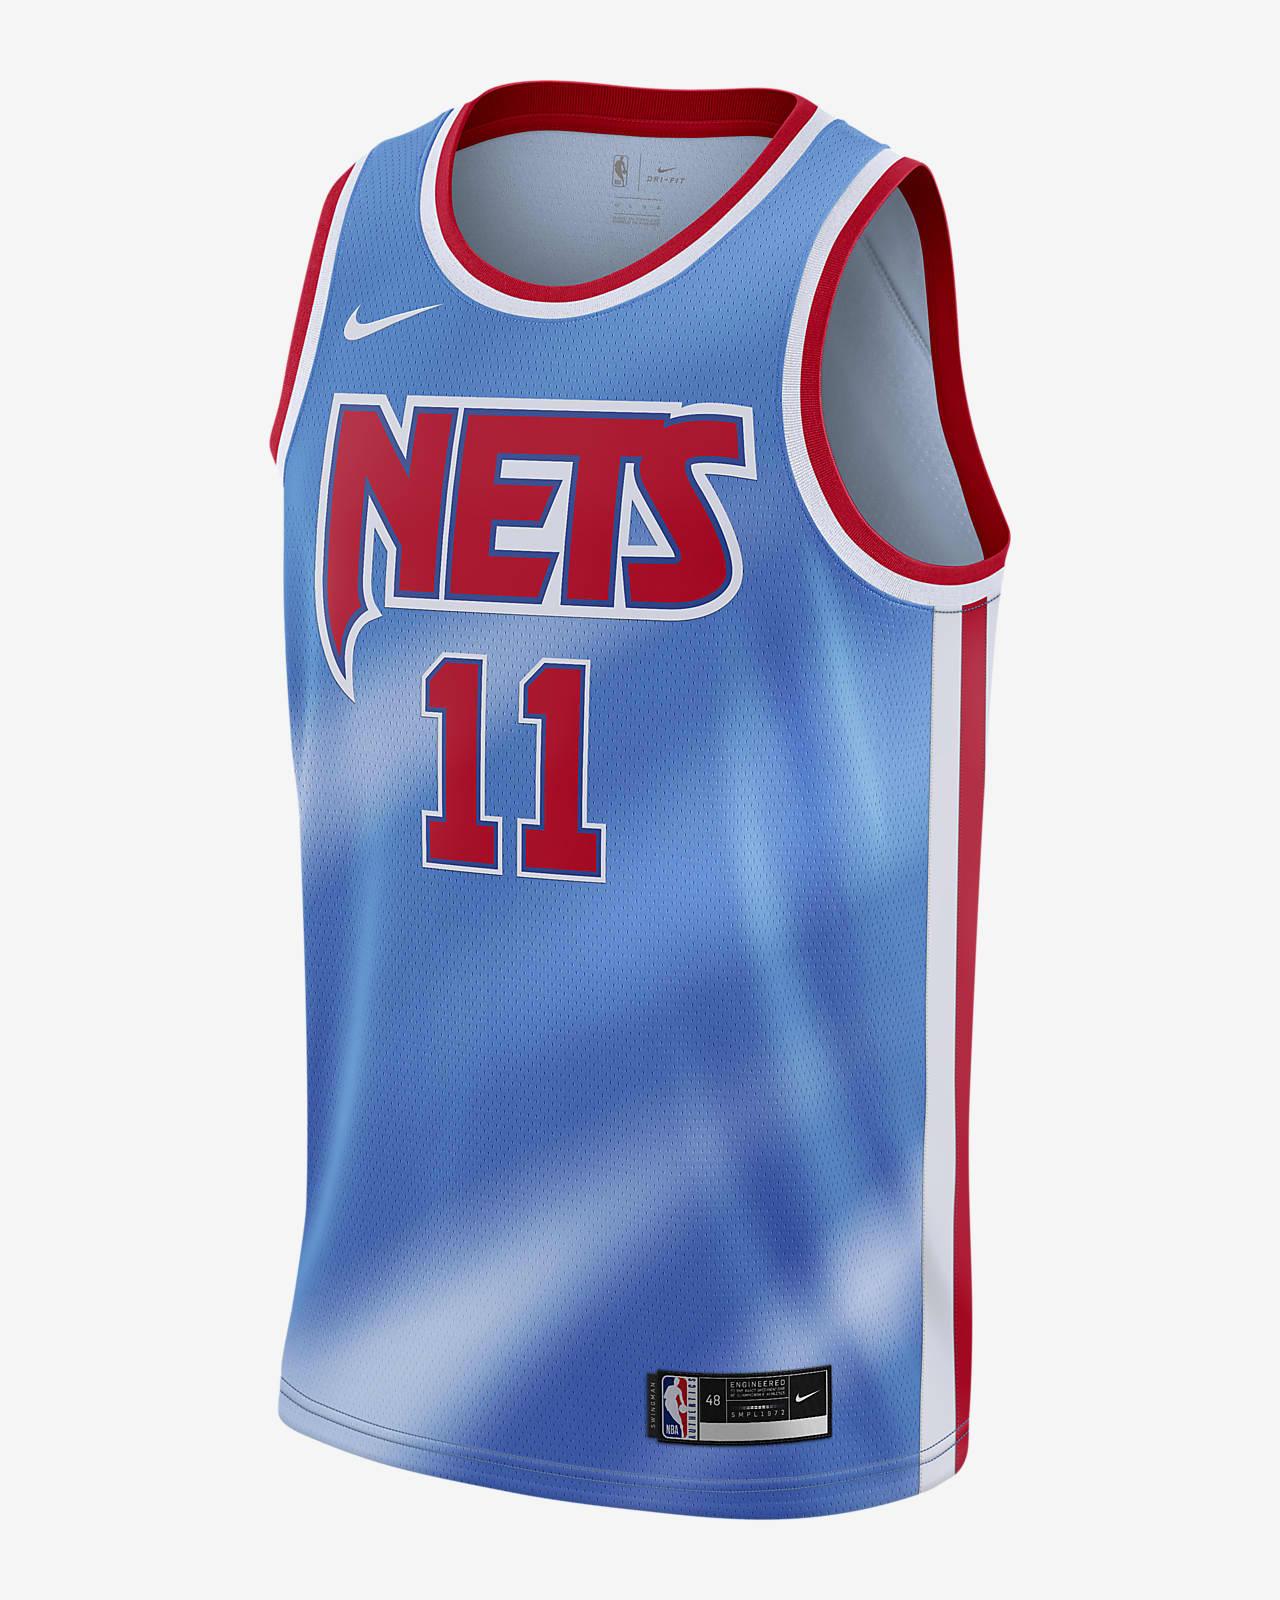 Kyrie Irving Brooklyn Nets Classic Edition 2020 Nike NBA Swingman Jersey